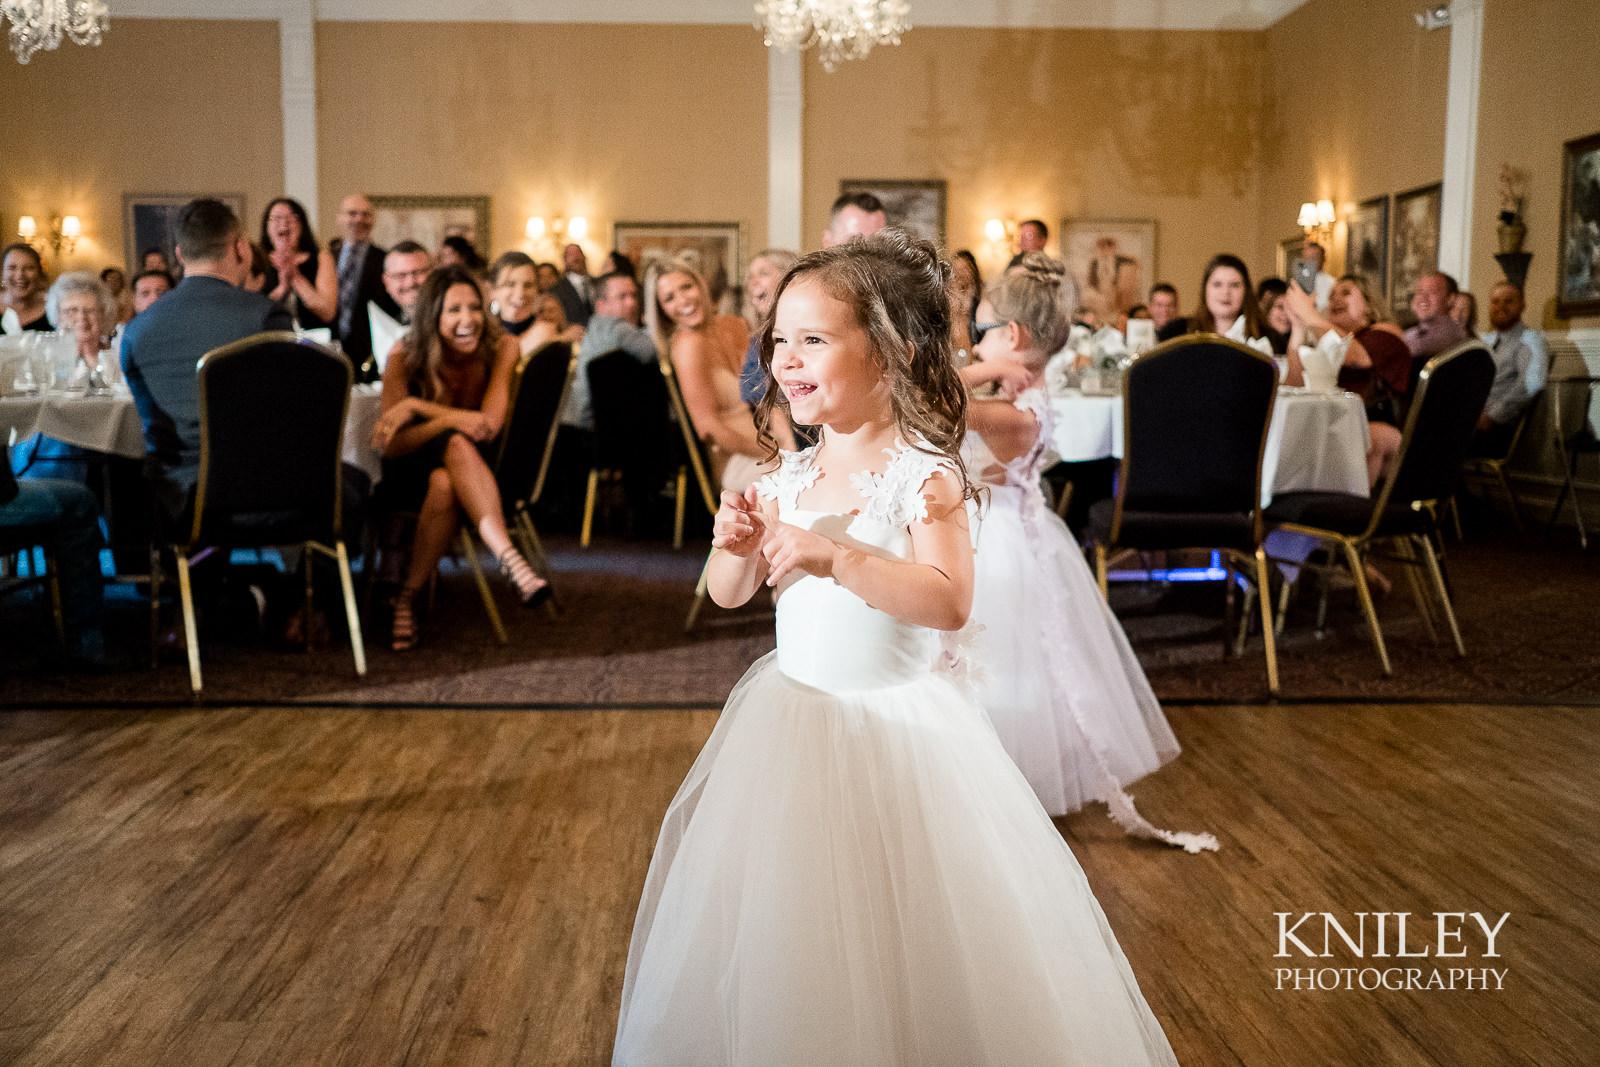 092 - Buffalo NY wedding pictures - Sean Patrick Restaurant Wedding Reception - Getzville - XT2B9377.jpg